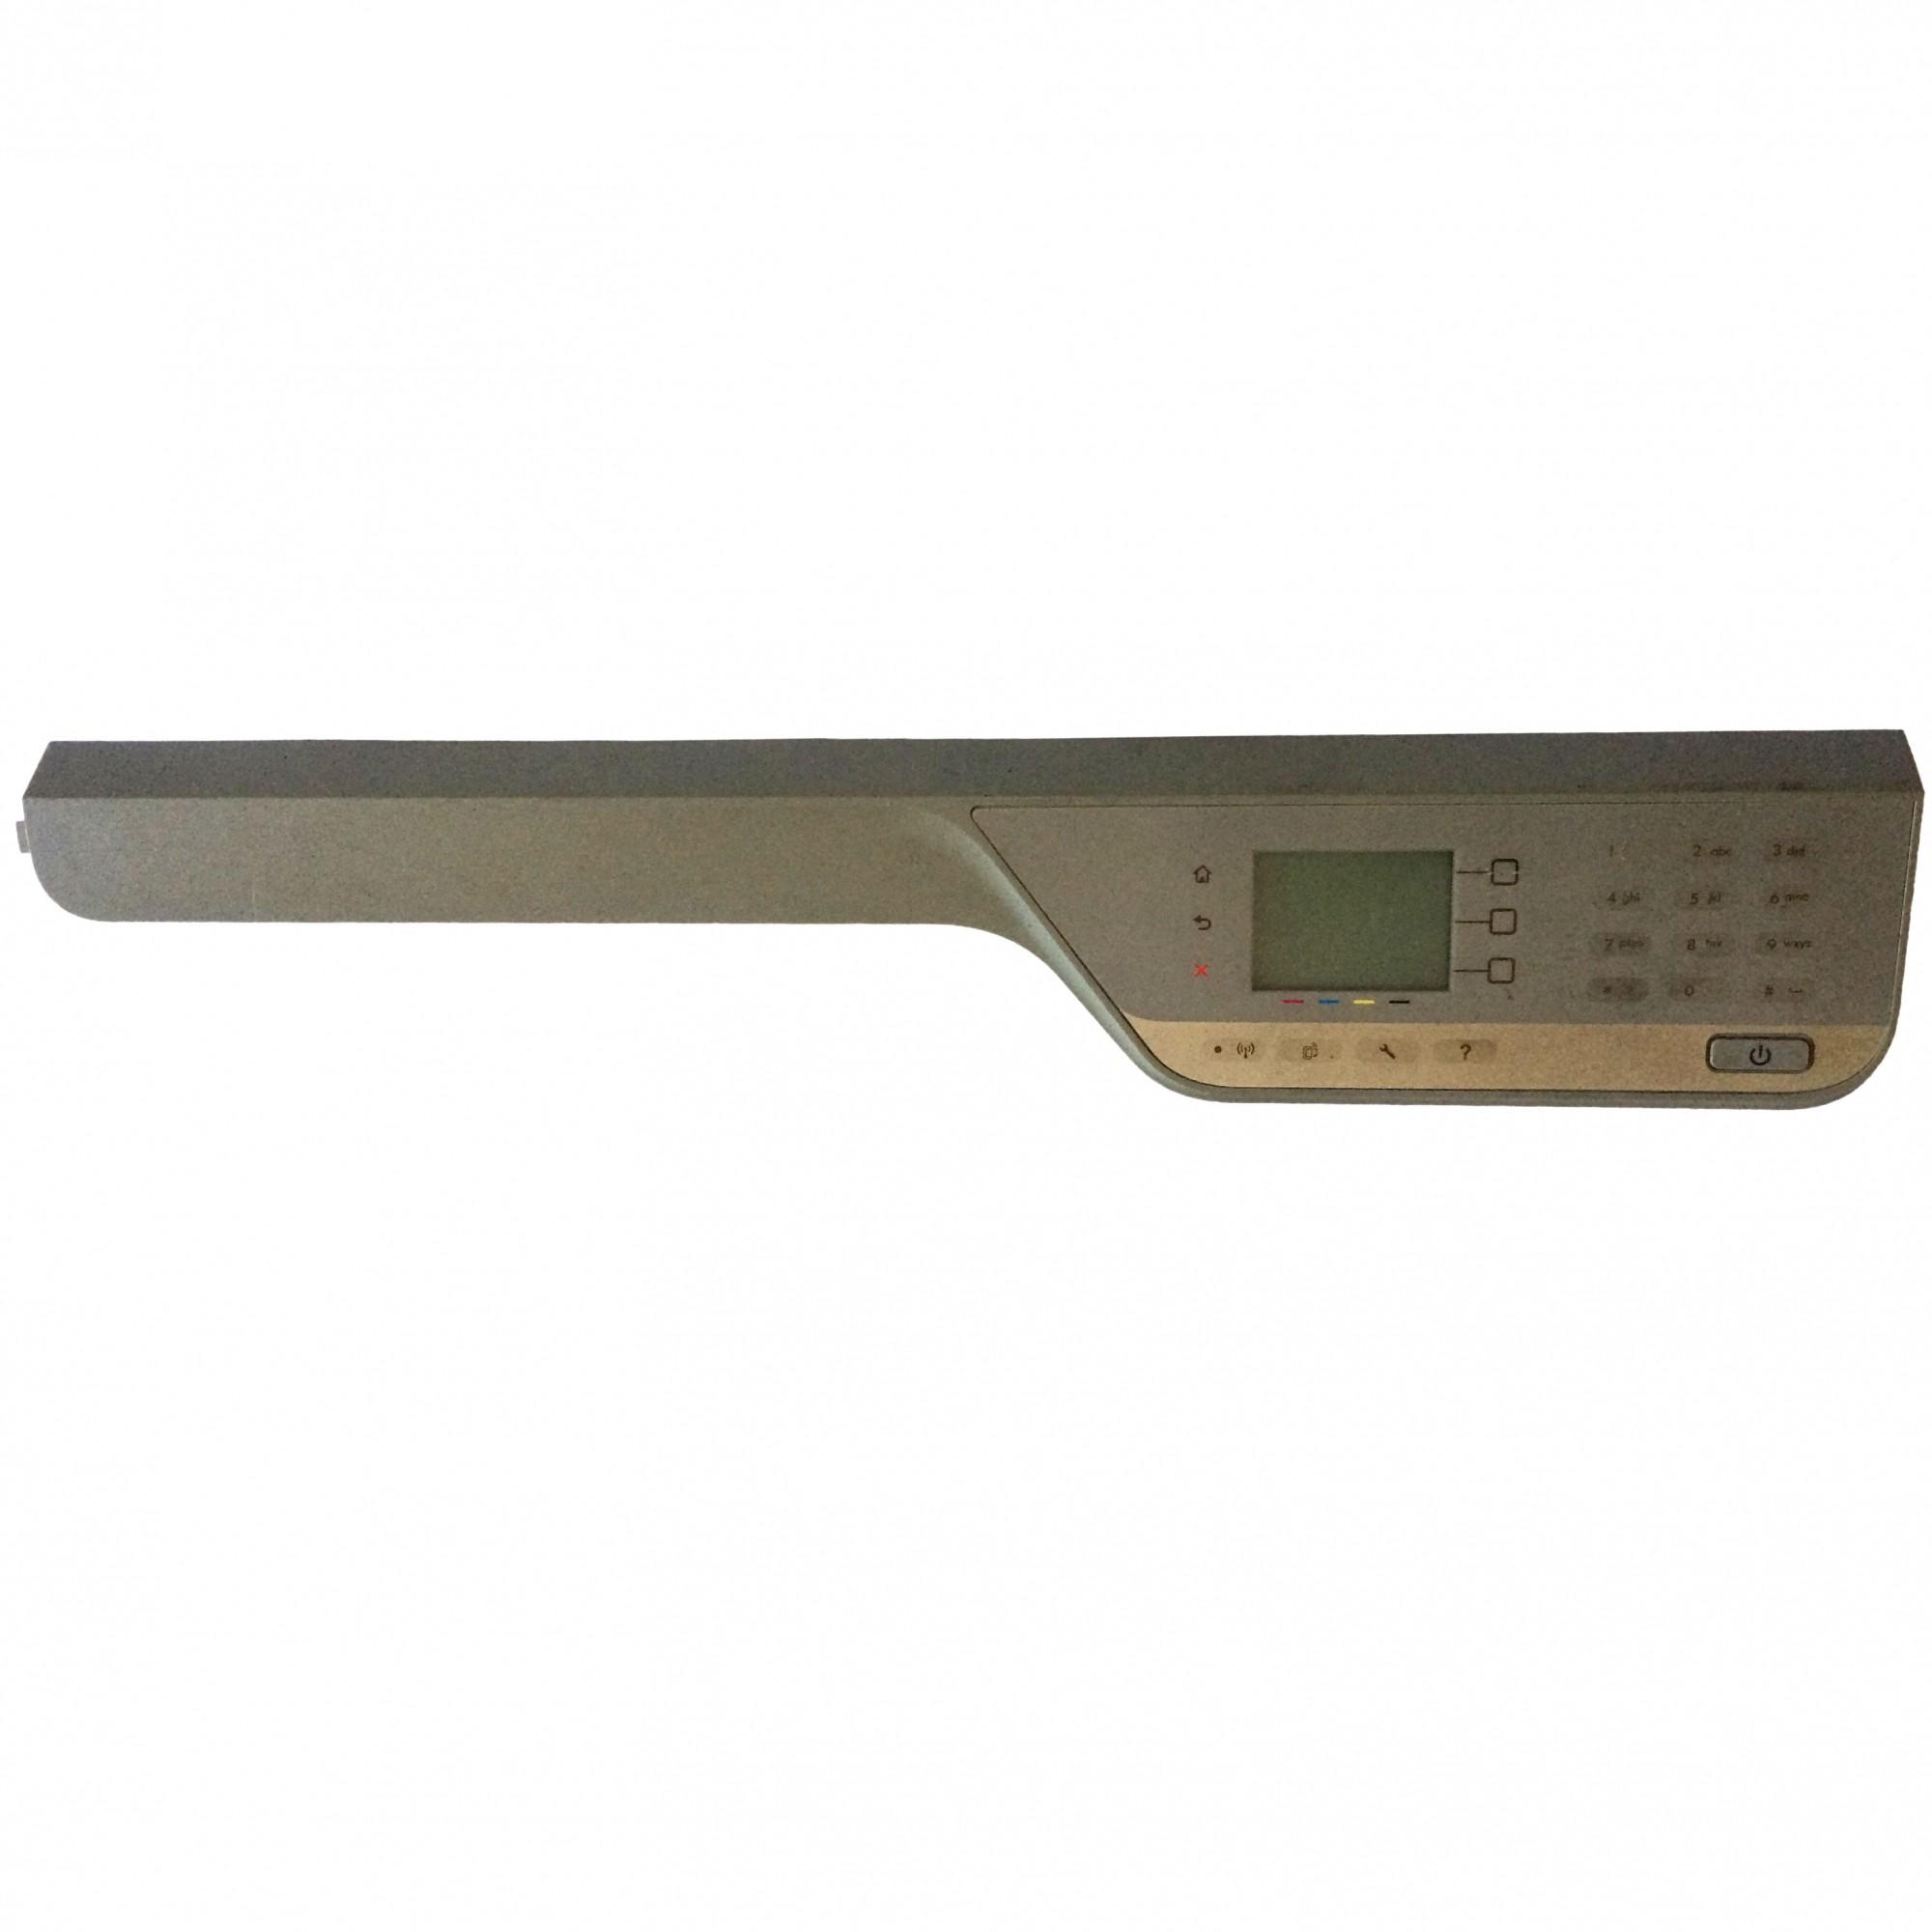 Painel Frontal Completo + Placa Multifuncional HP Deskjet Ink Advantage 4625 PN:cz152-40001 - Retirado